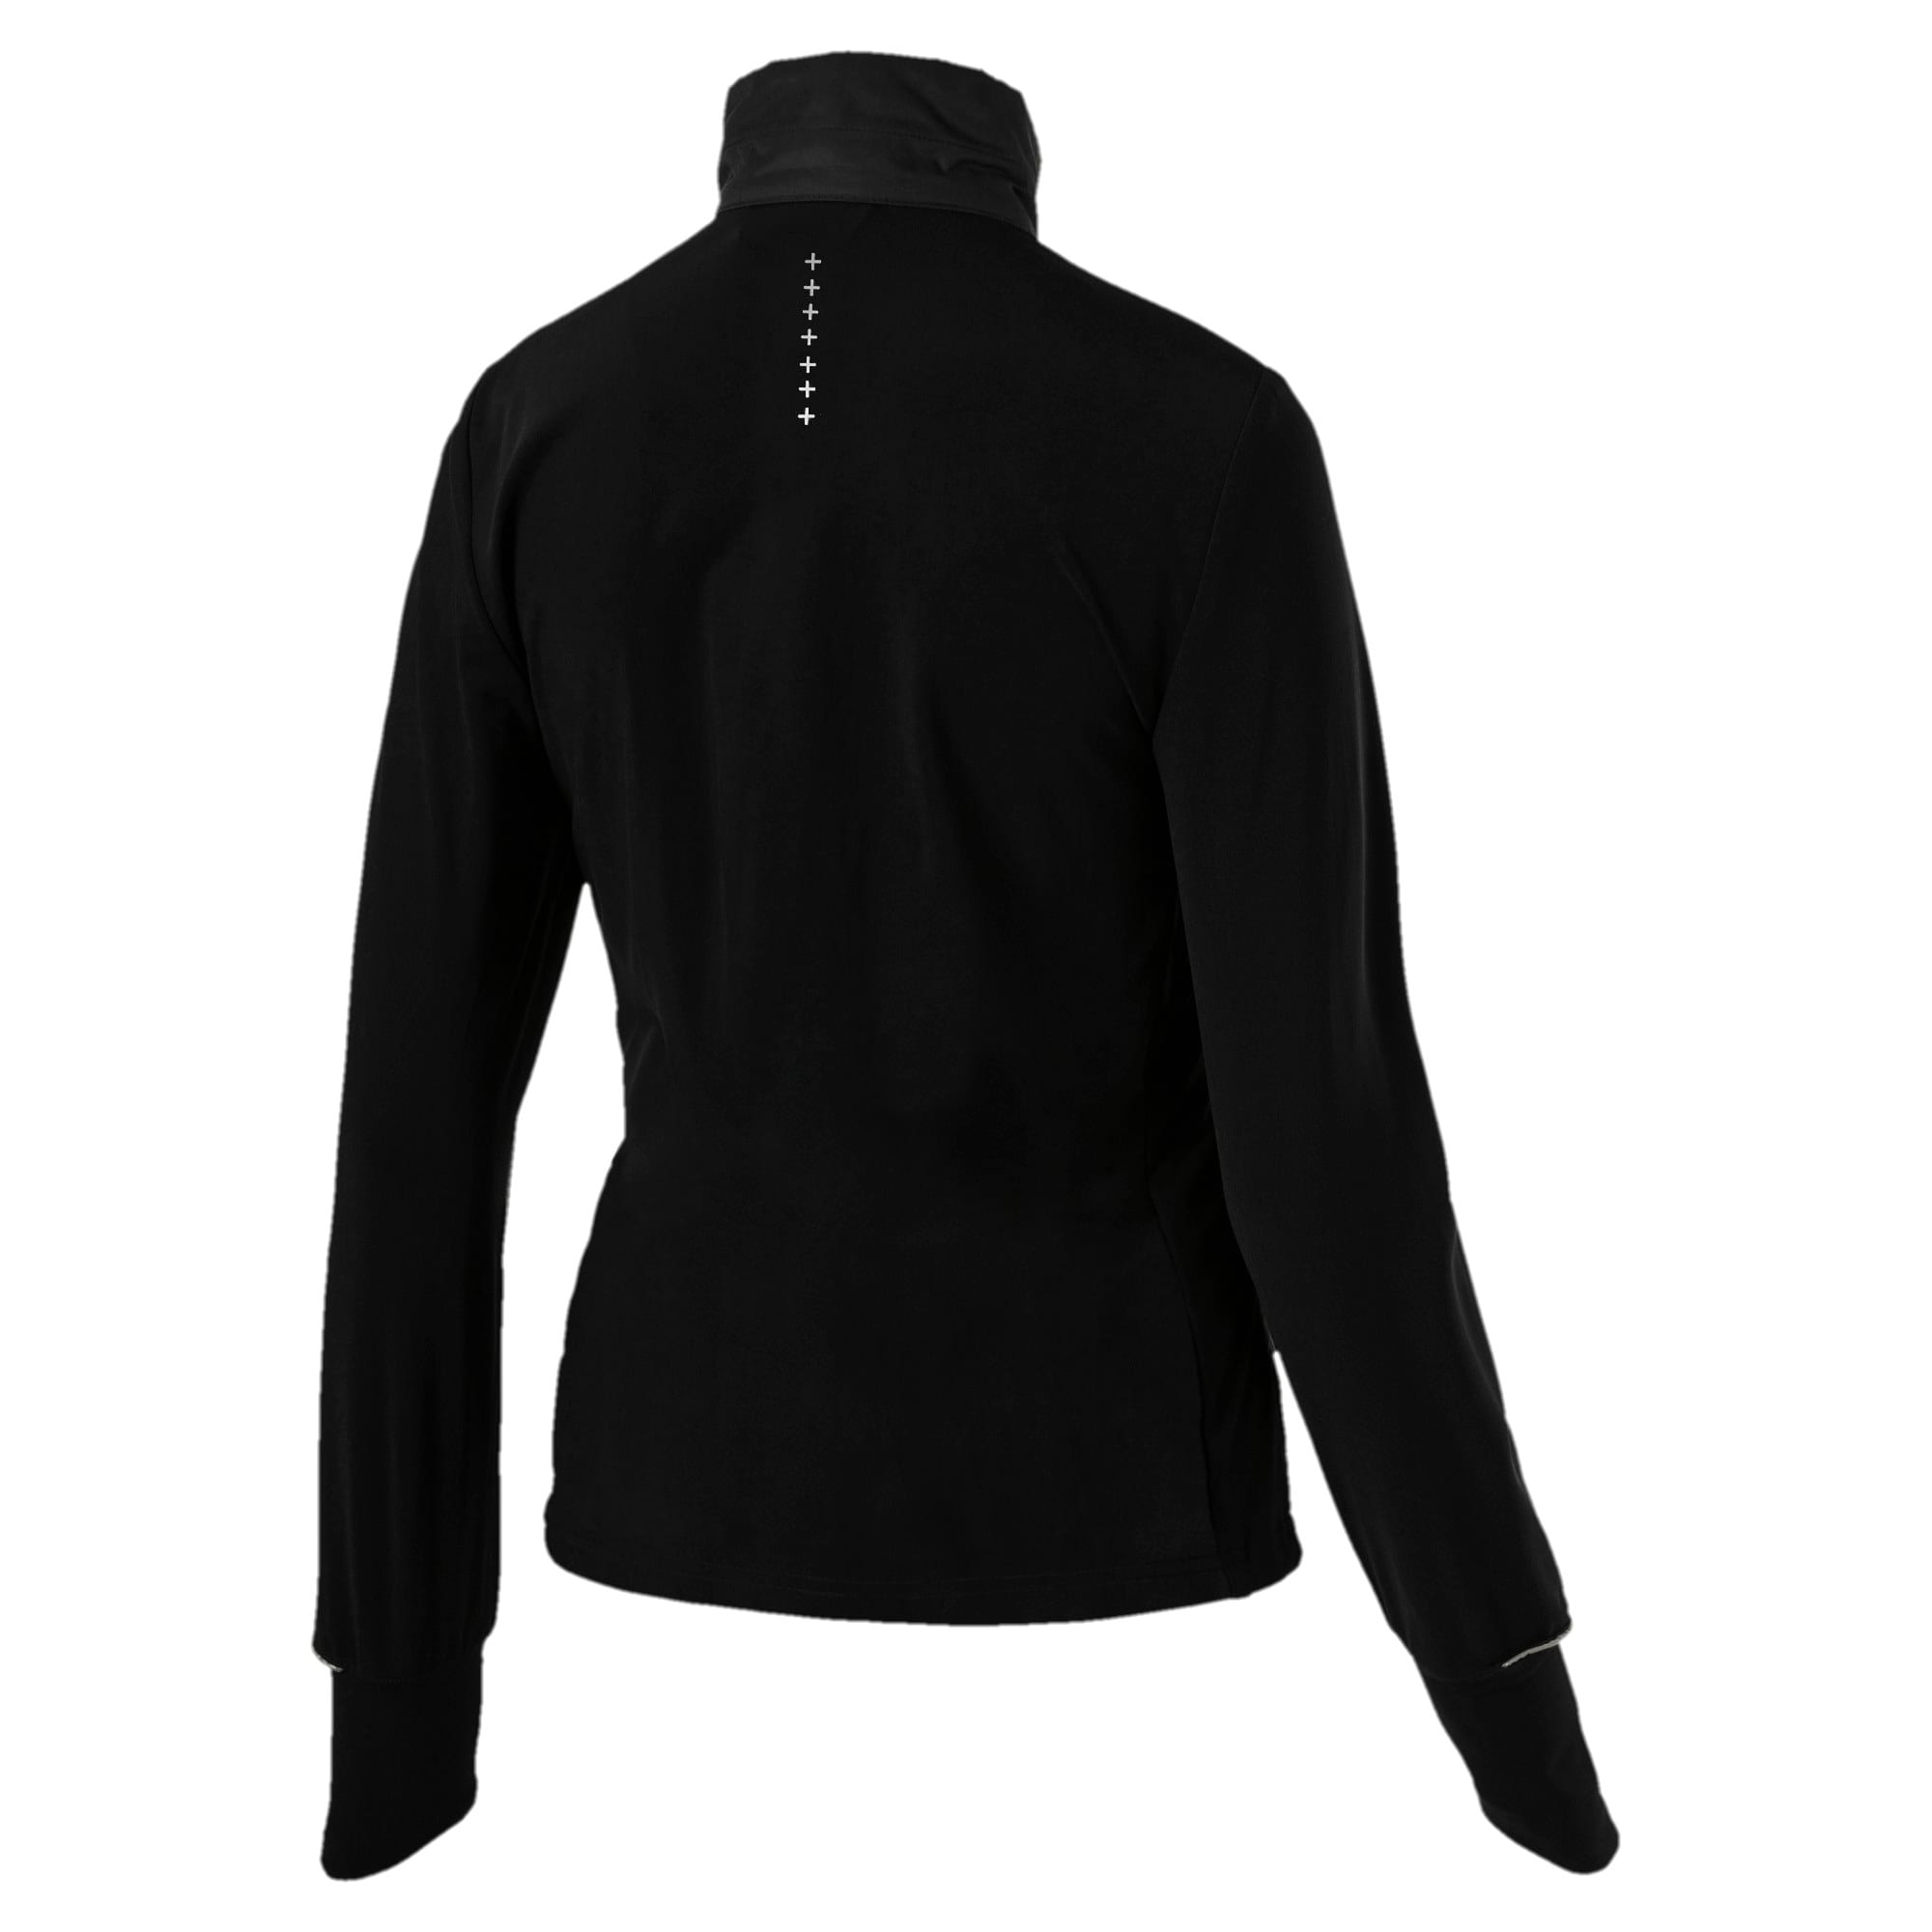 Thumbnail 4 of Winter Zip-Up Women's Jacket, Puma Black, medium